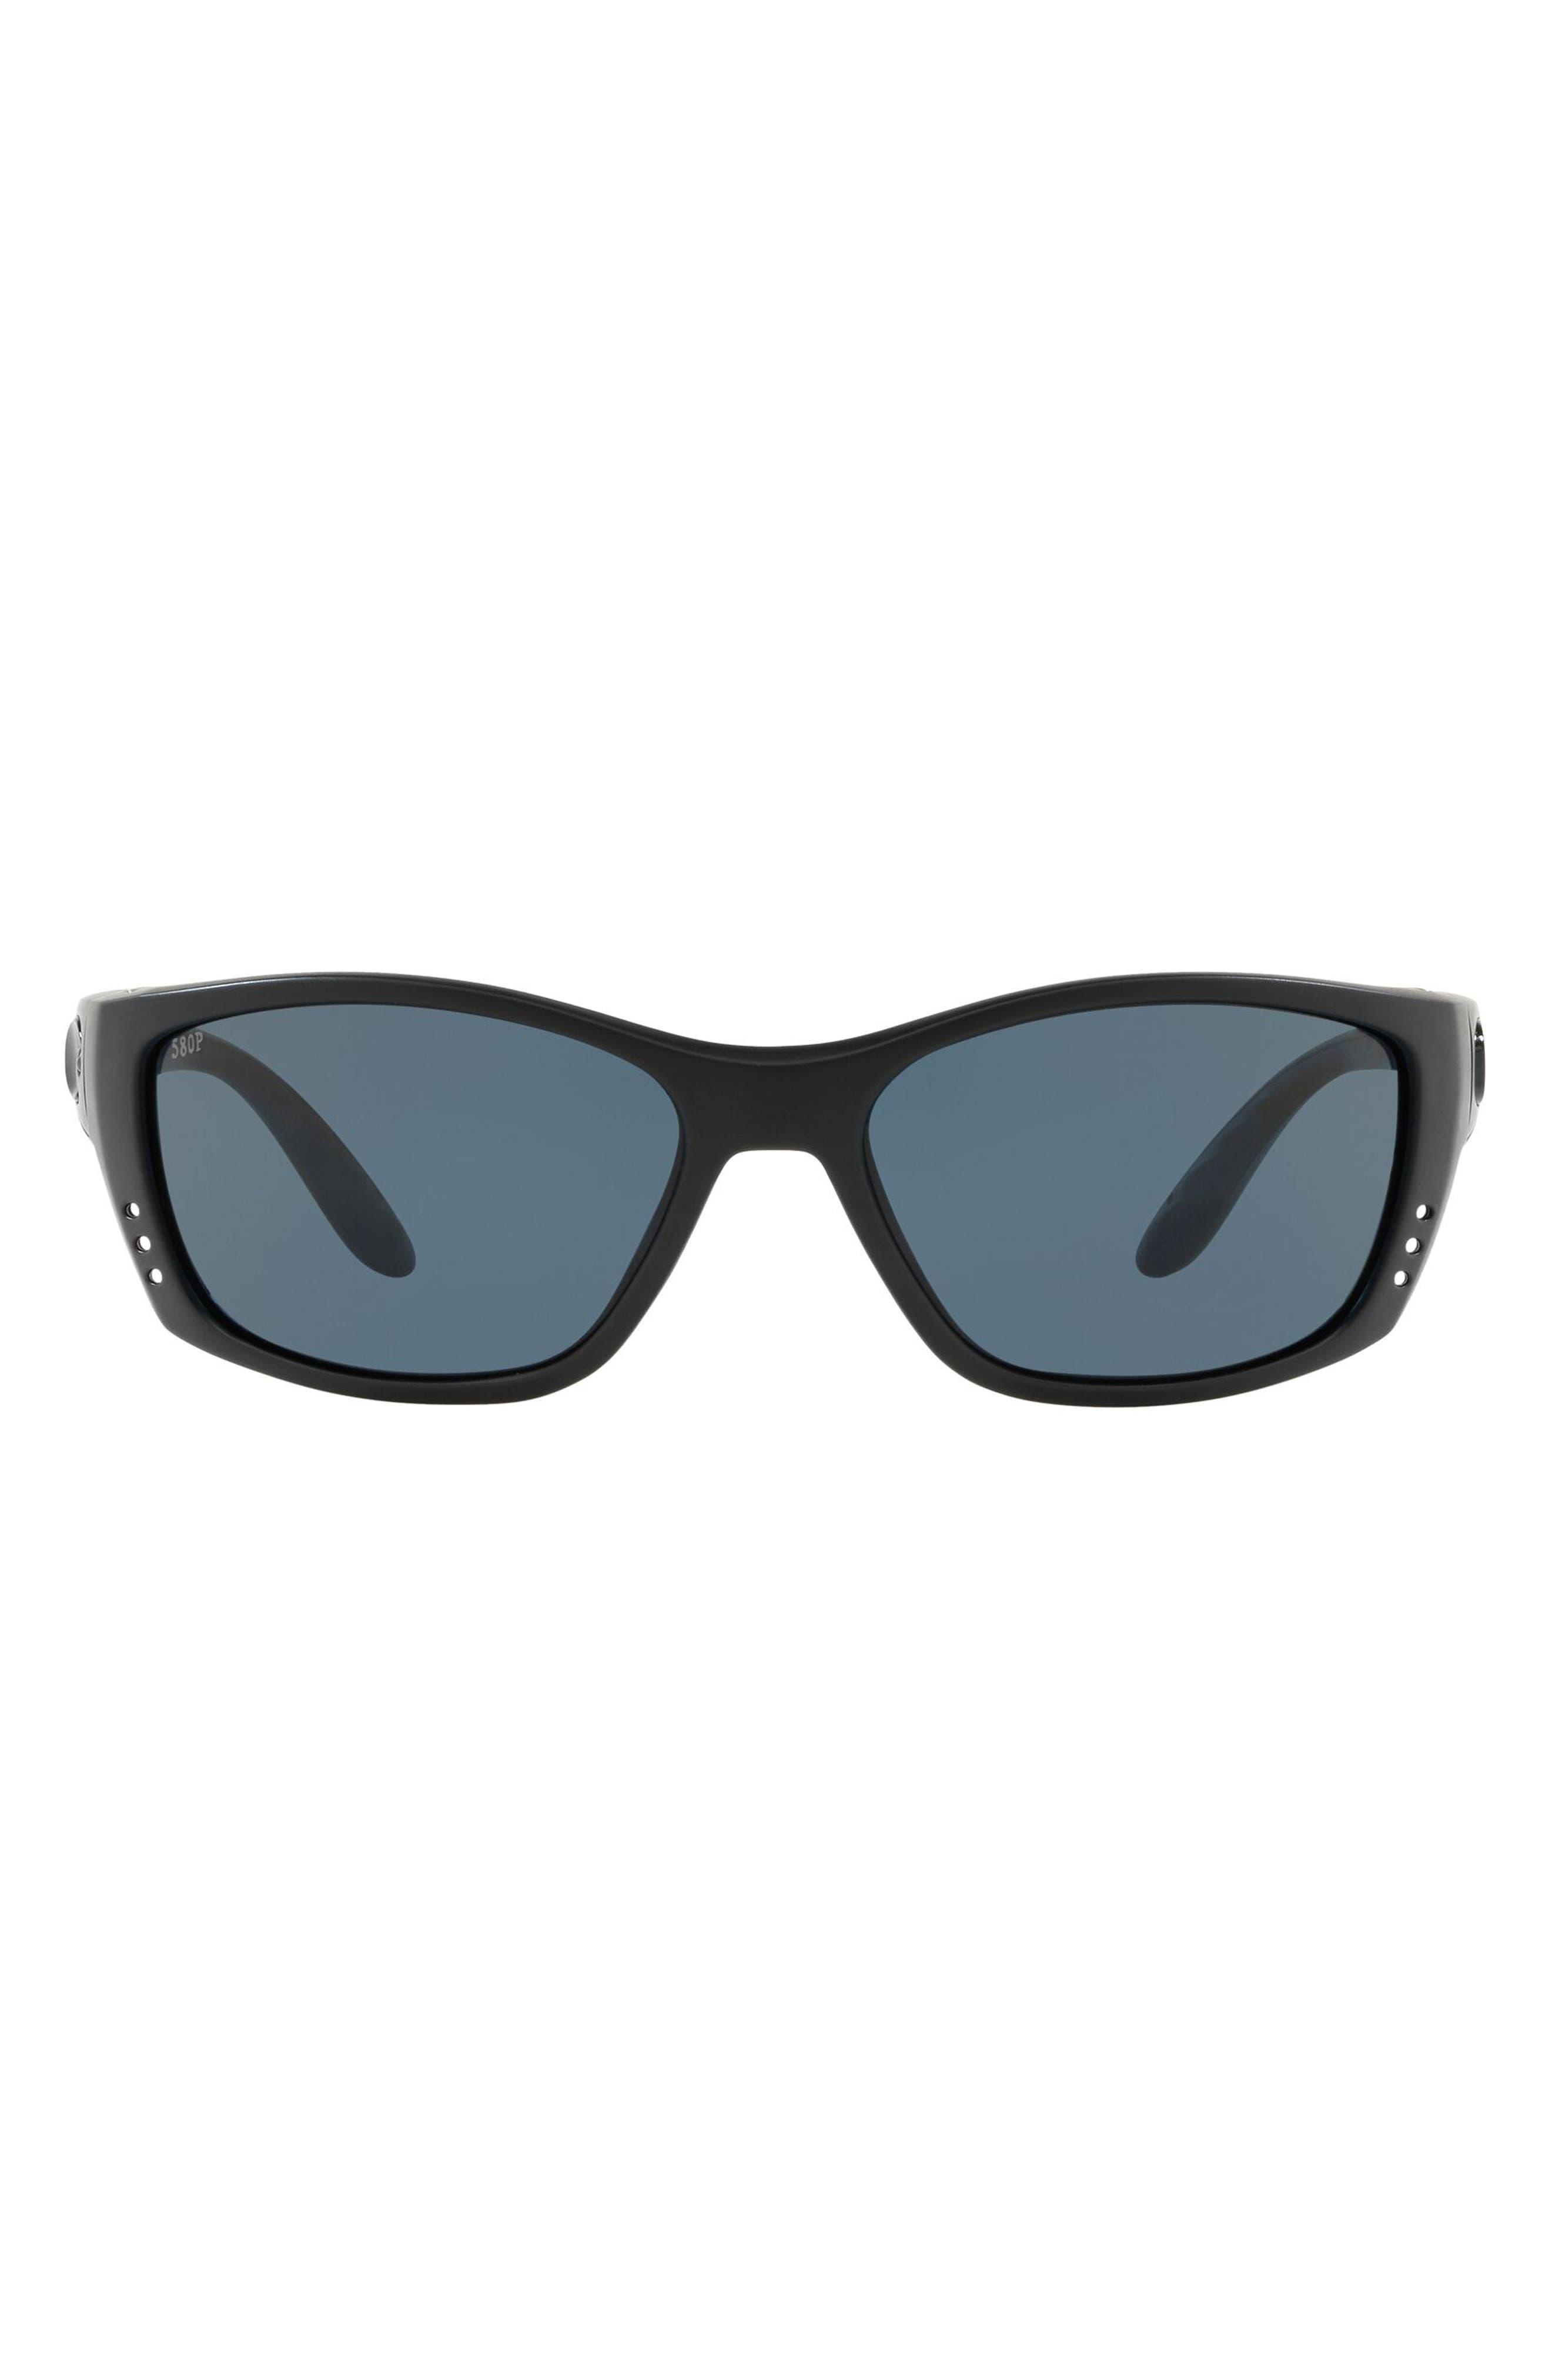 64mm Polarized Wraparound Sunglasses